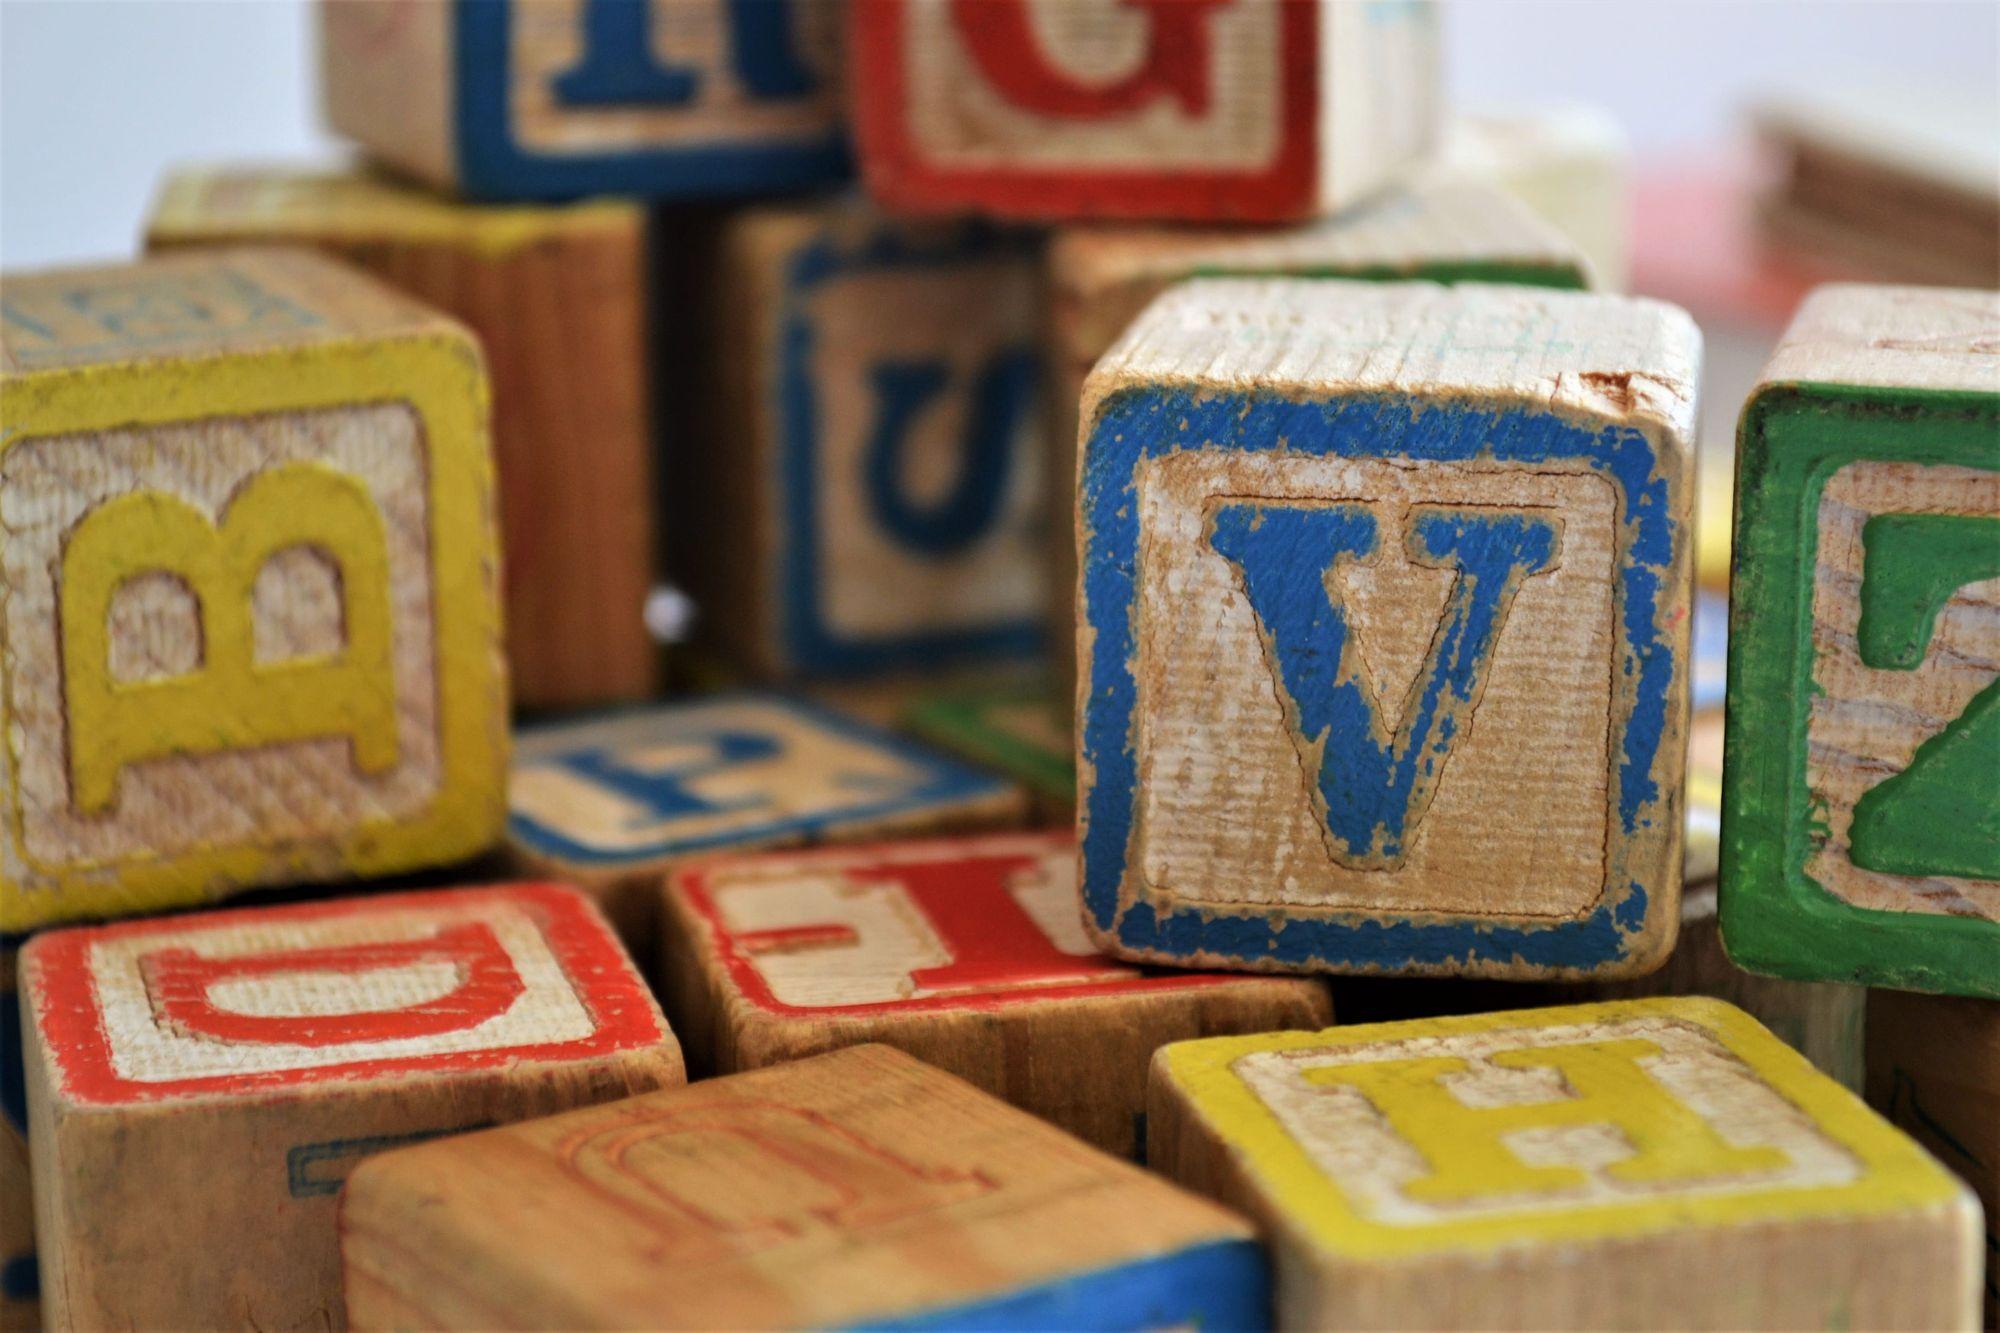 Lettered Building blocks